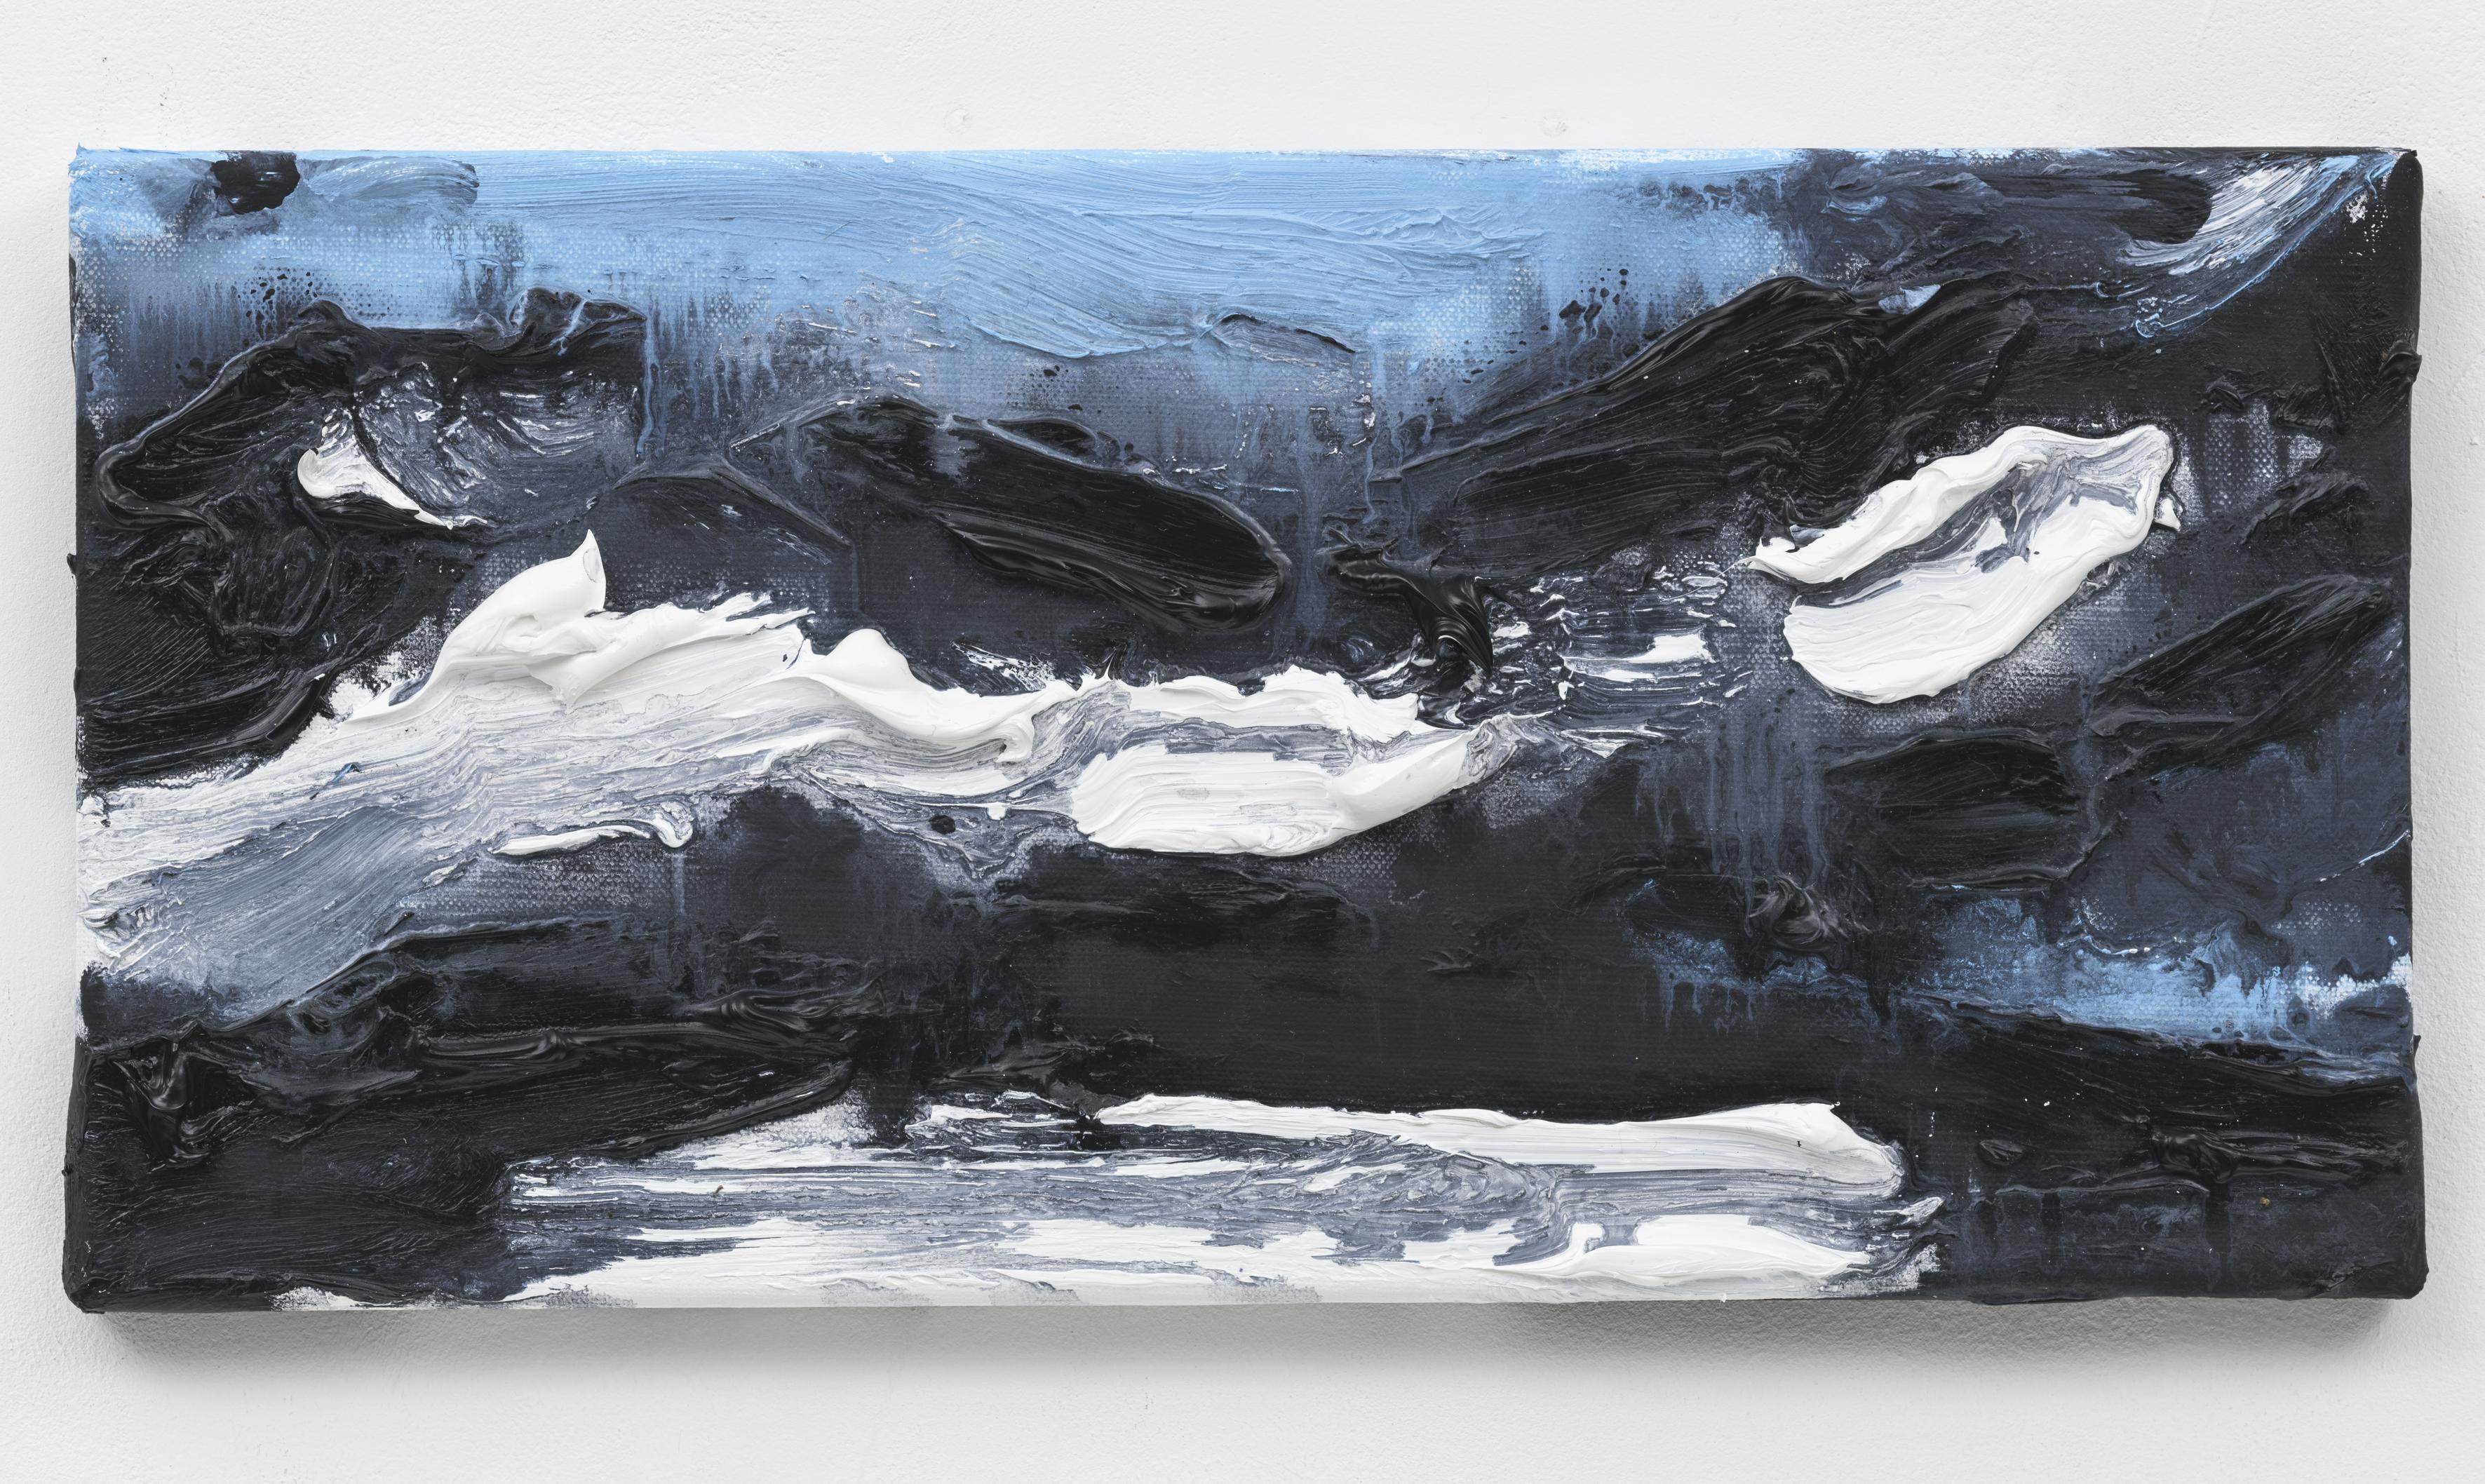 """Wanderung VI, Berlin Suite"" 20 x 40 cm. oil on linen 2018 (Special Edition, Berlin)"